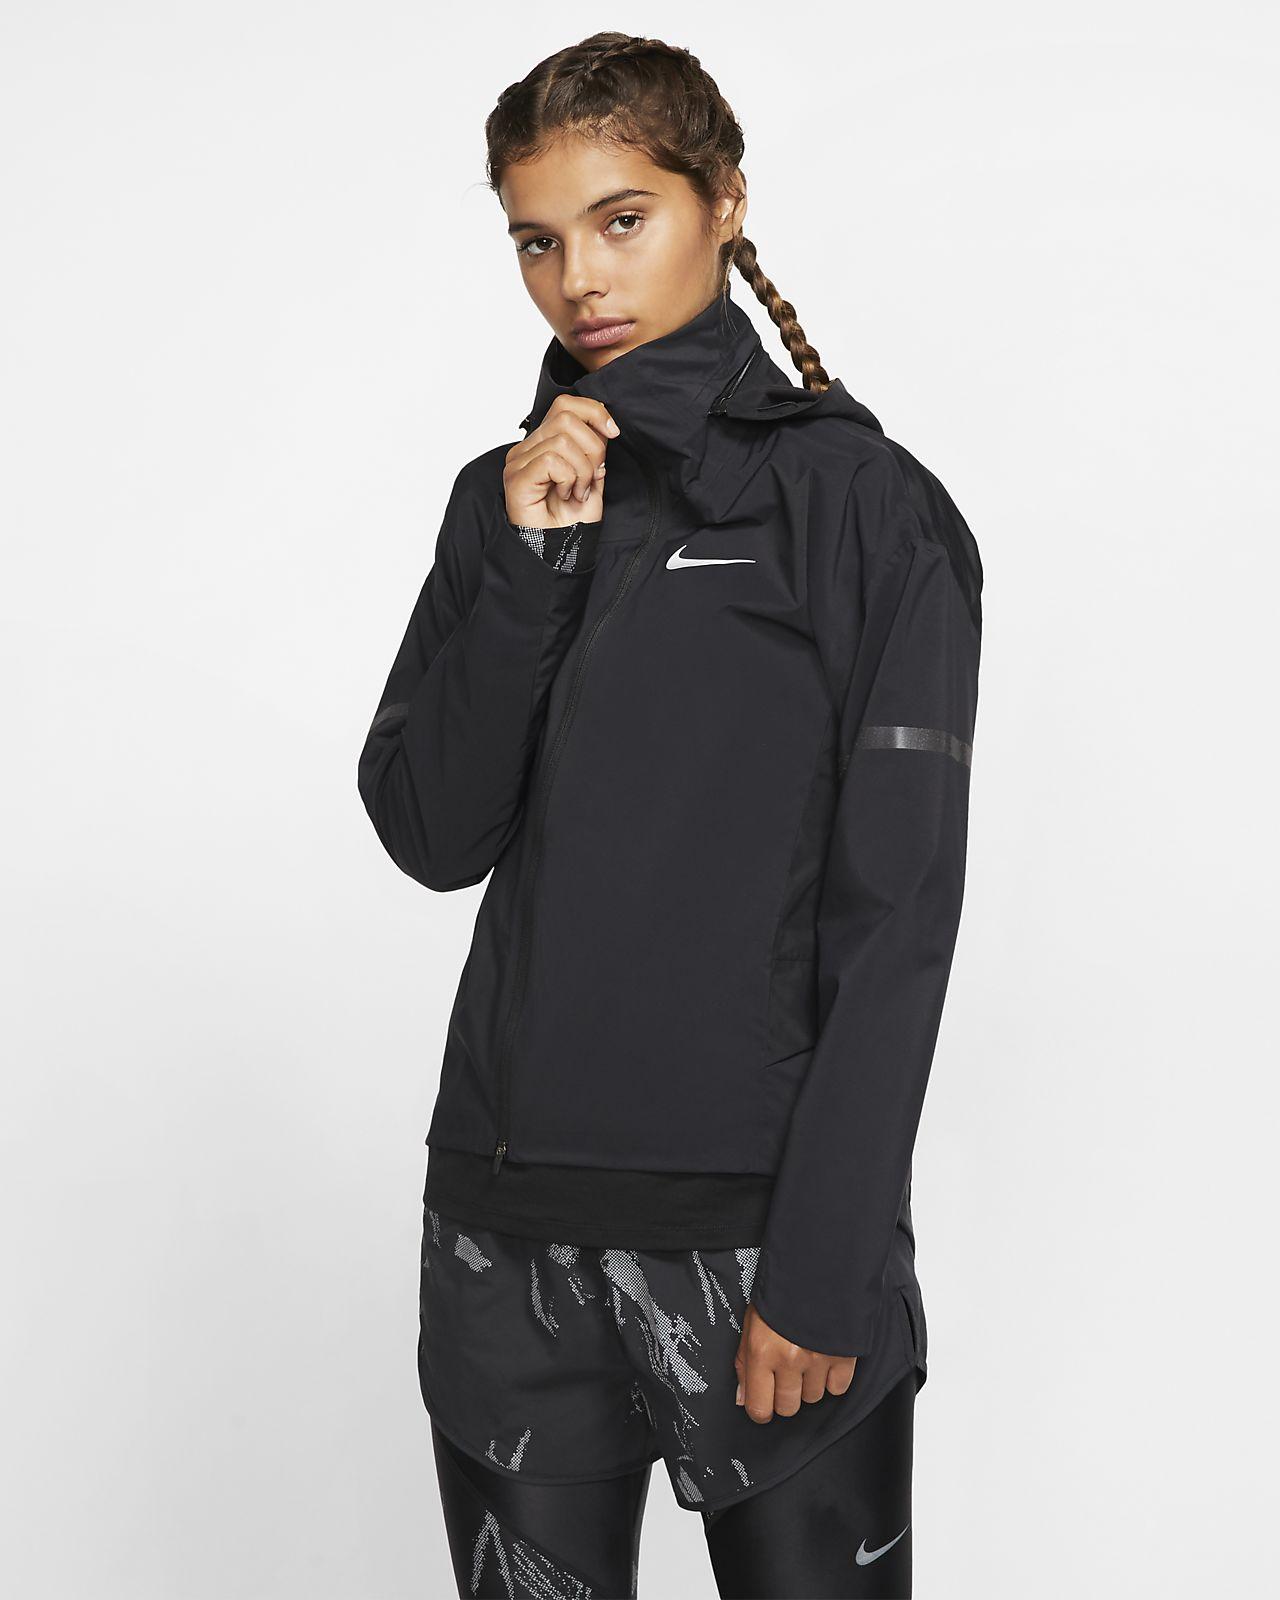 Nike AeroShield Women's Hooded Running Jacket